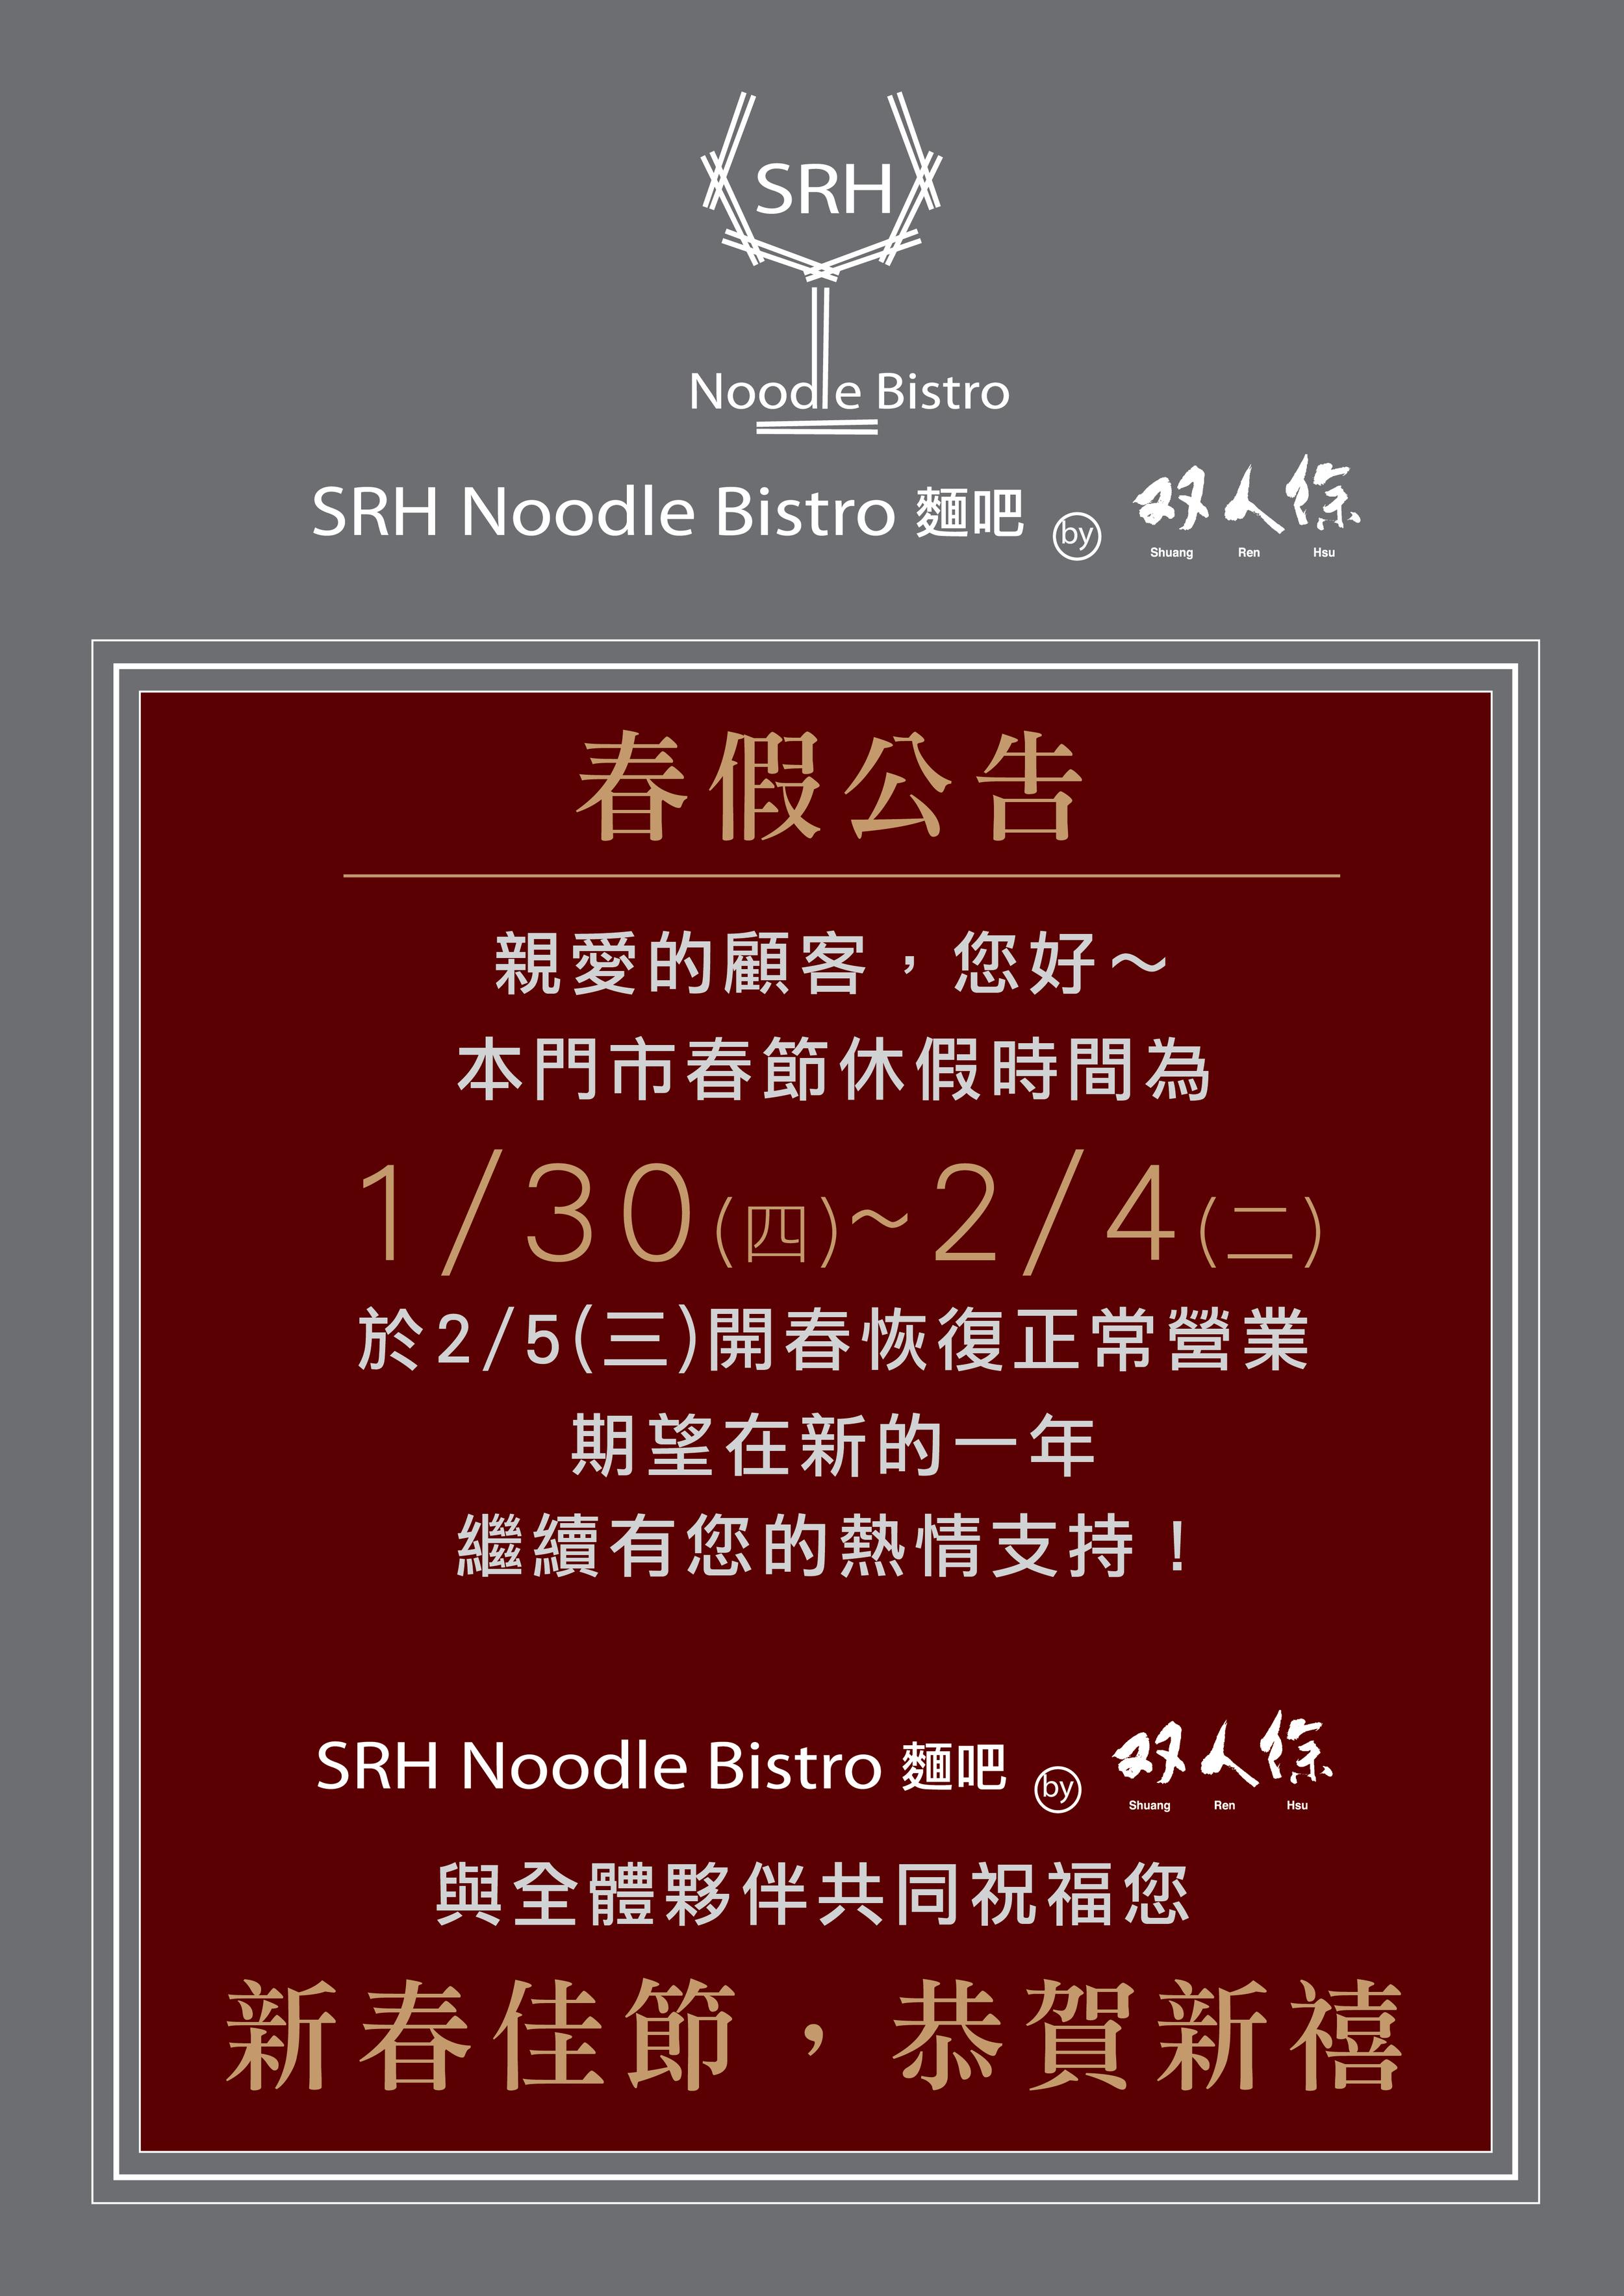 SRH新年春假公告_B-01.jpg